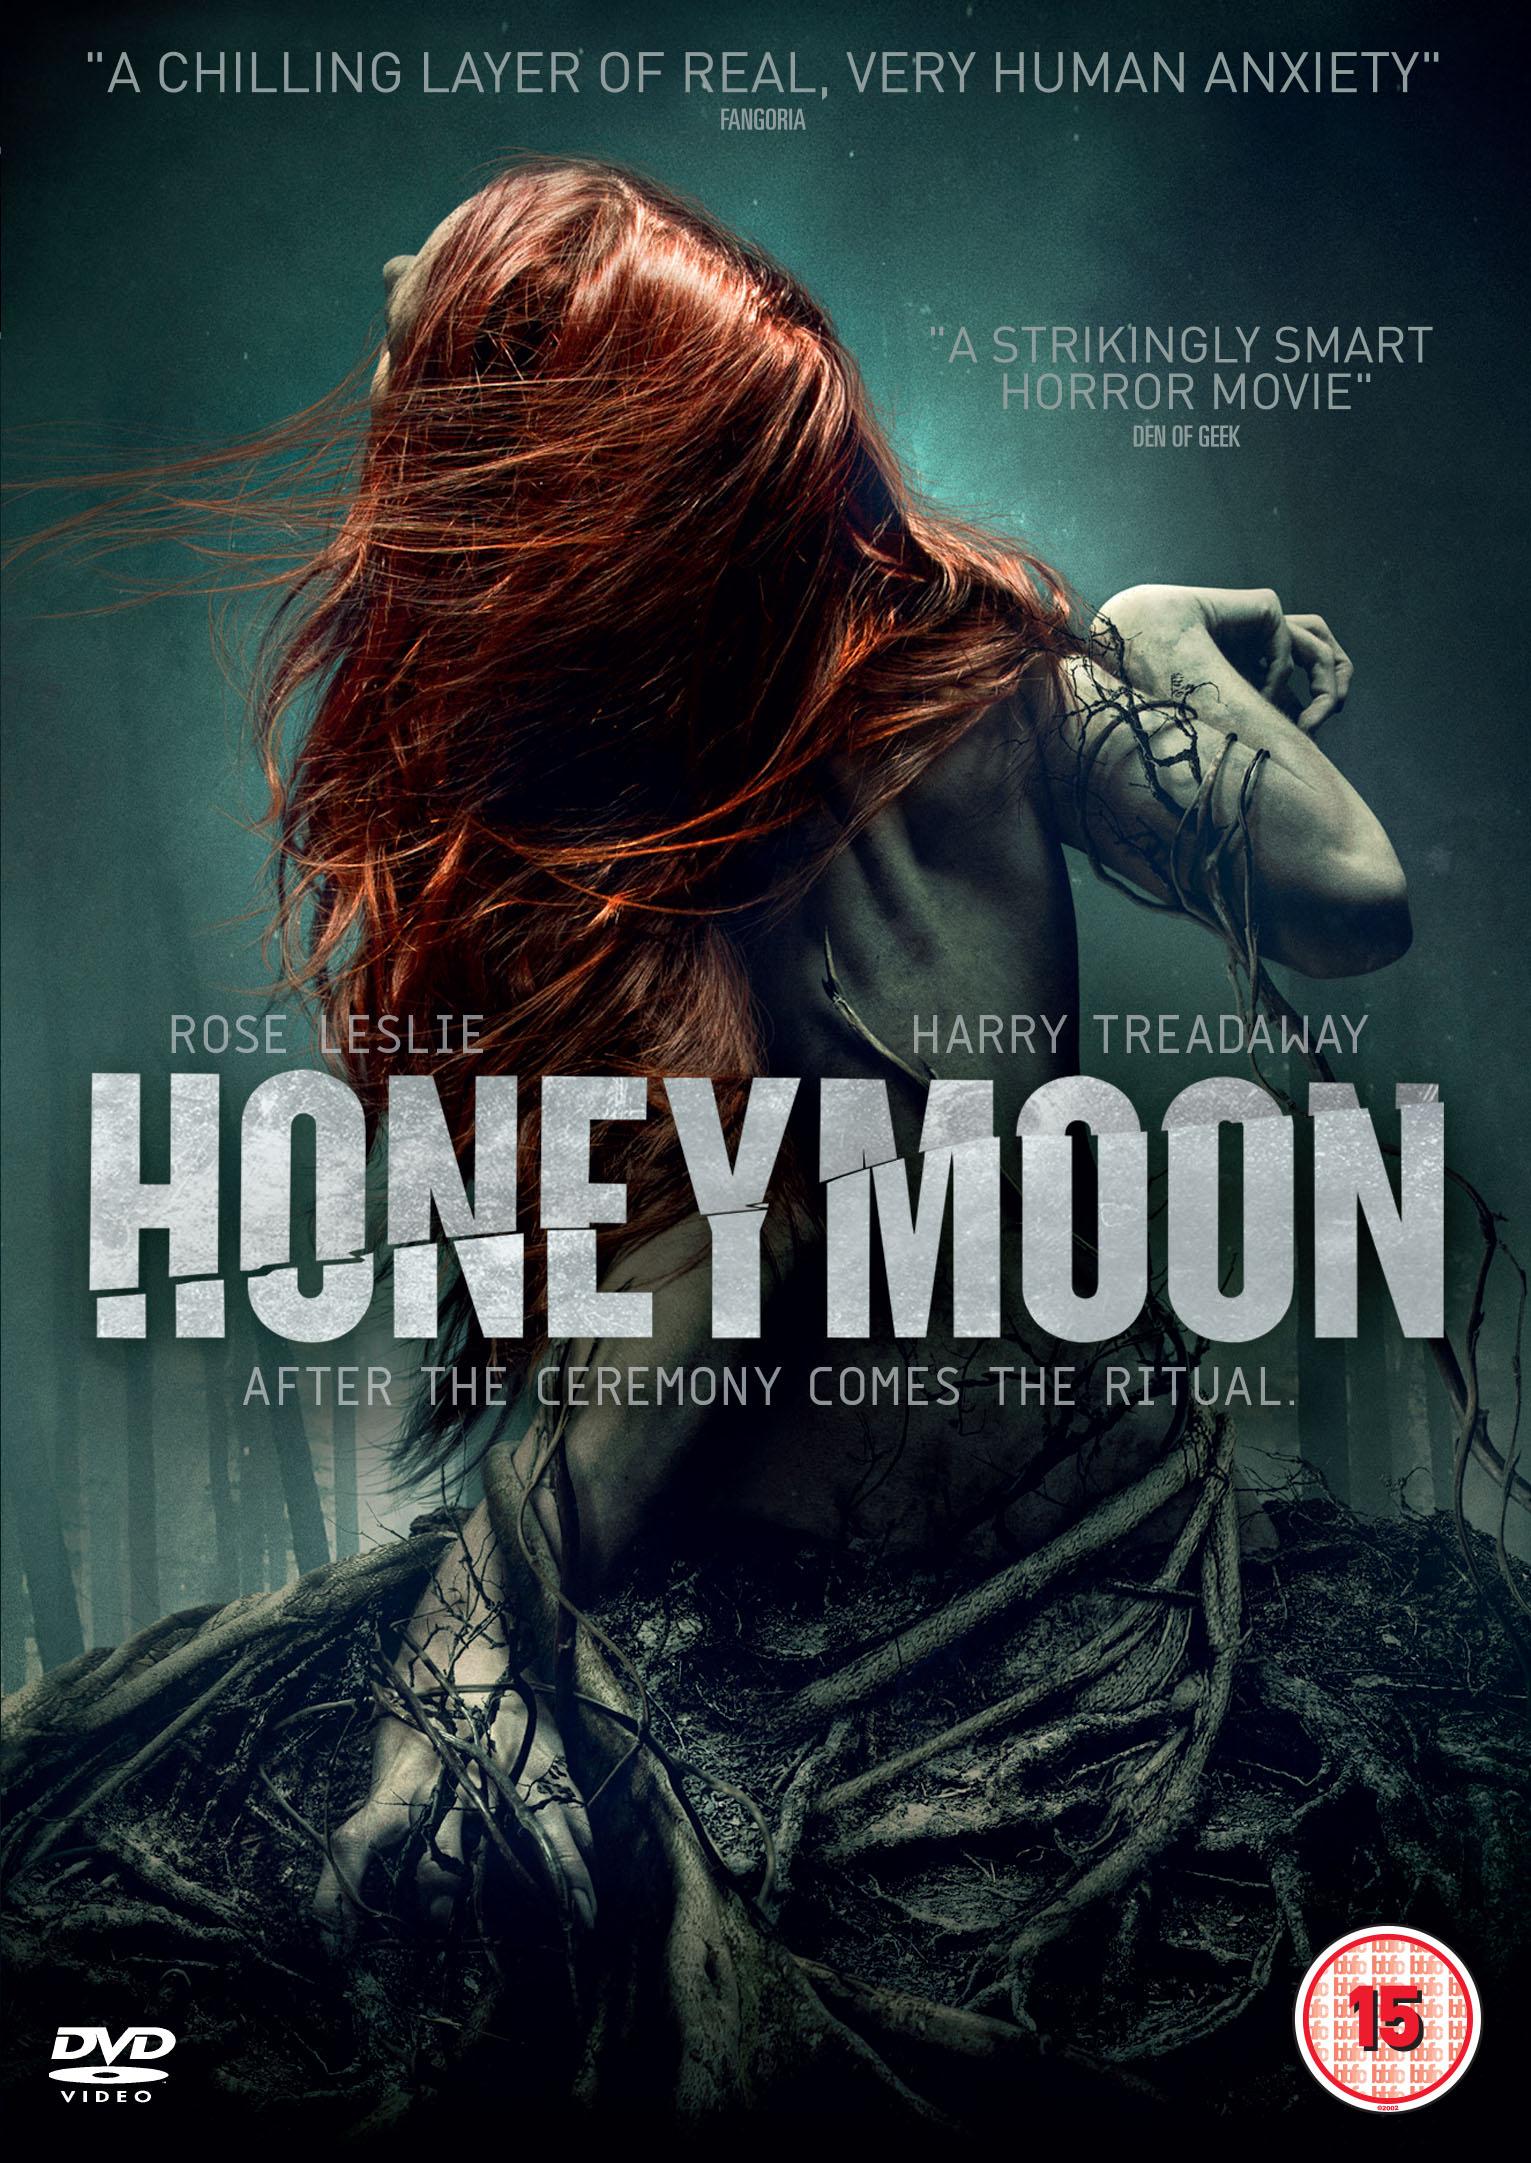 Honeymoon Film